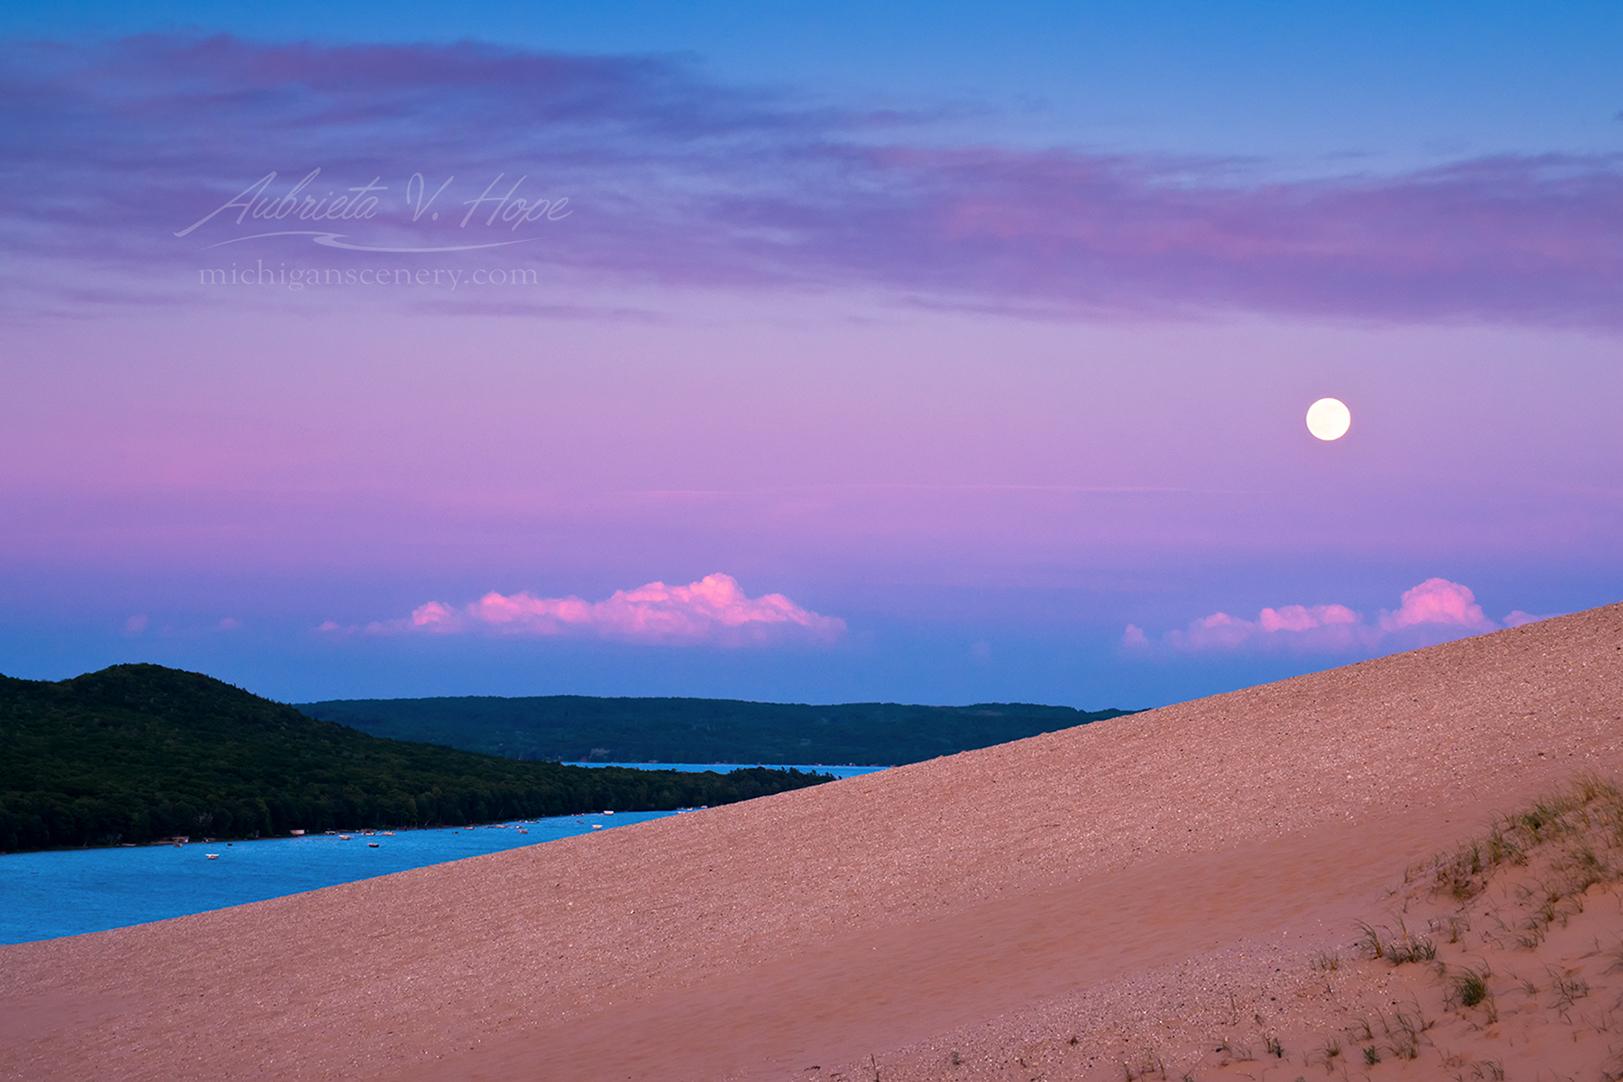 MI15-0561-1792 Strawberry Moon at Sleeping Bear Dunes by Aubrieta V Hope Michigan Scenery.jpg